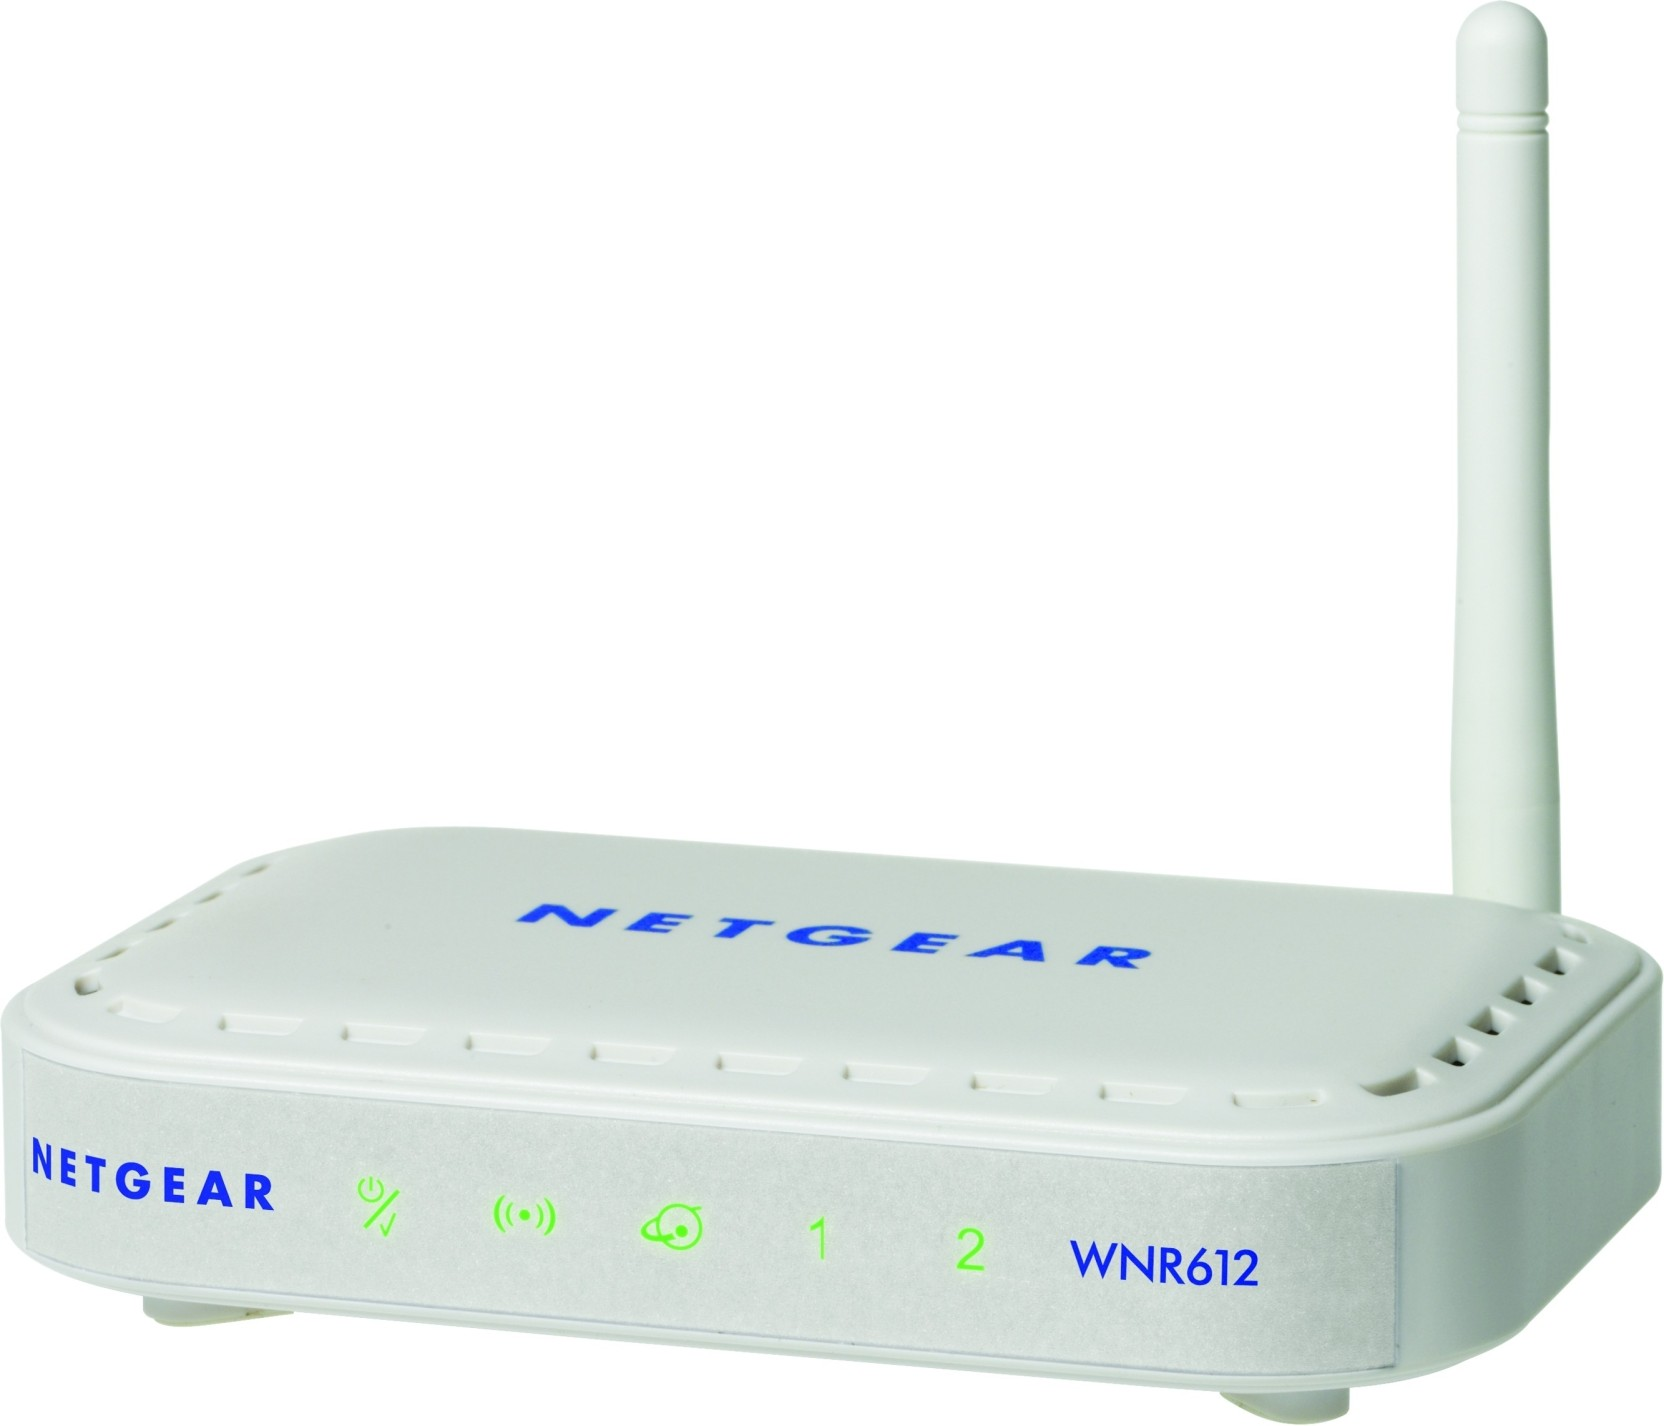 Netgear N150 Wireless Router Installation Wirelessrouterinstallation Classic 1664x1426